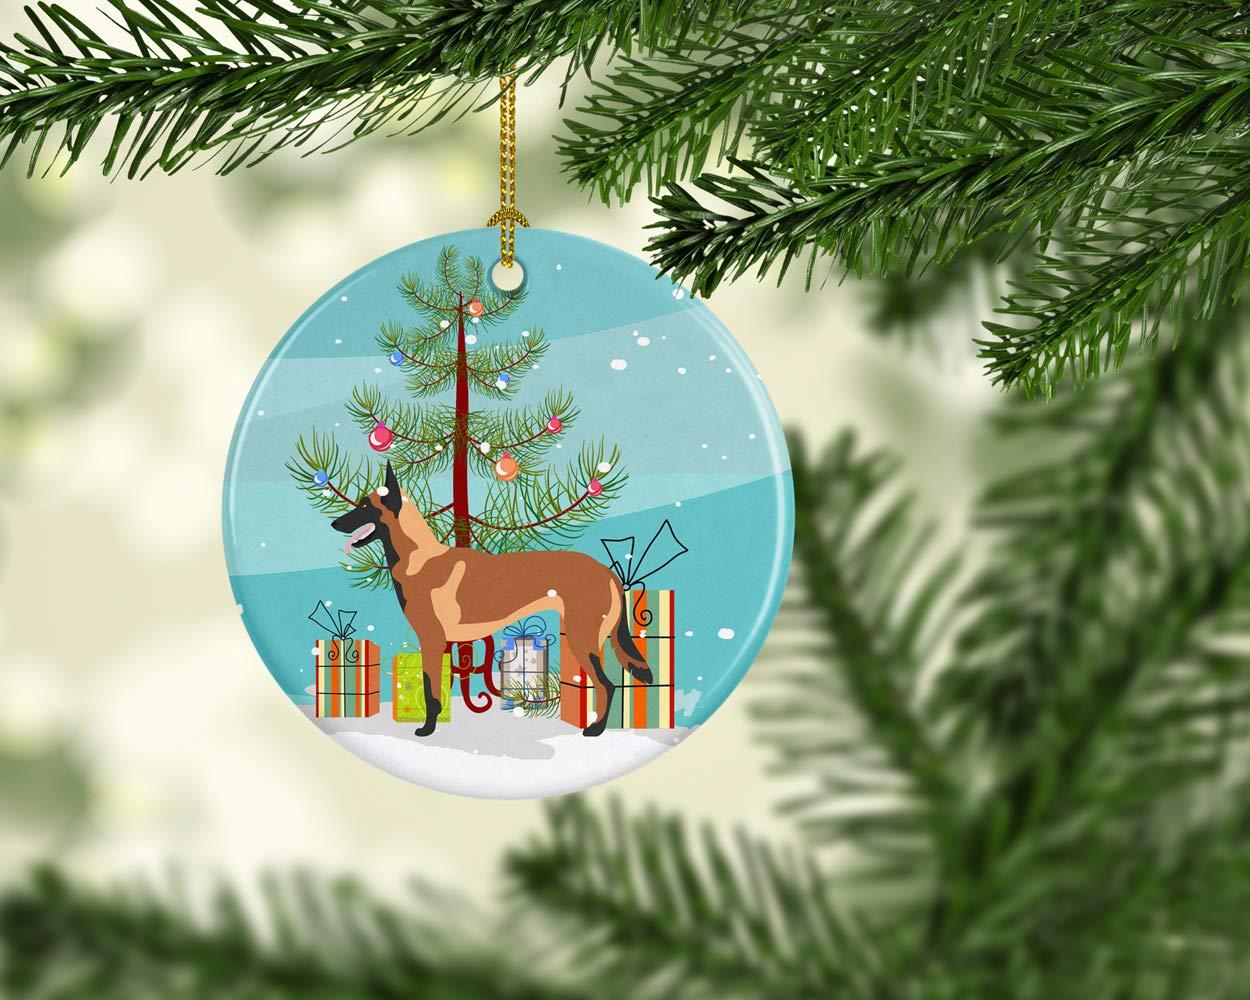 Carolines Treasures BB8494CO1 Malinois Belgian Shepherd Christmas Ceramic Ornament Multicolor 3 in